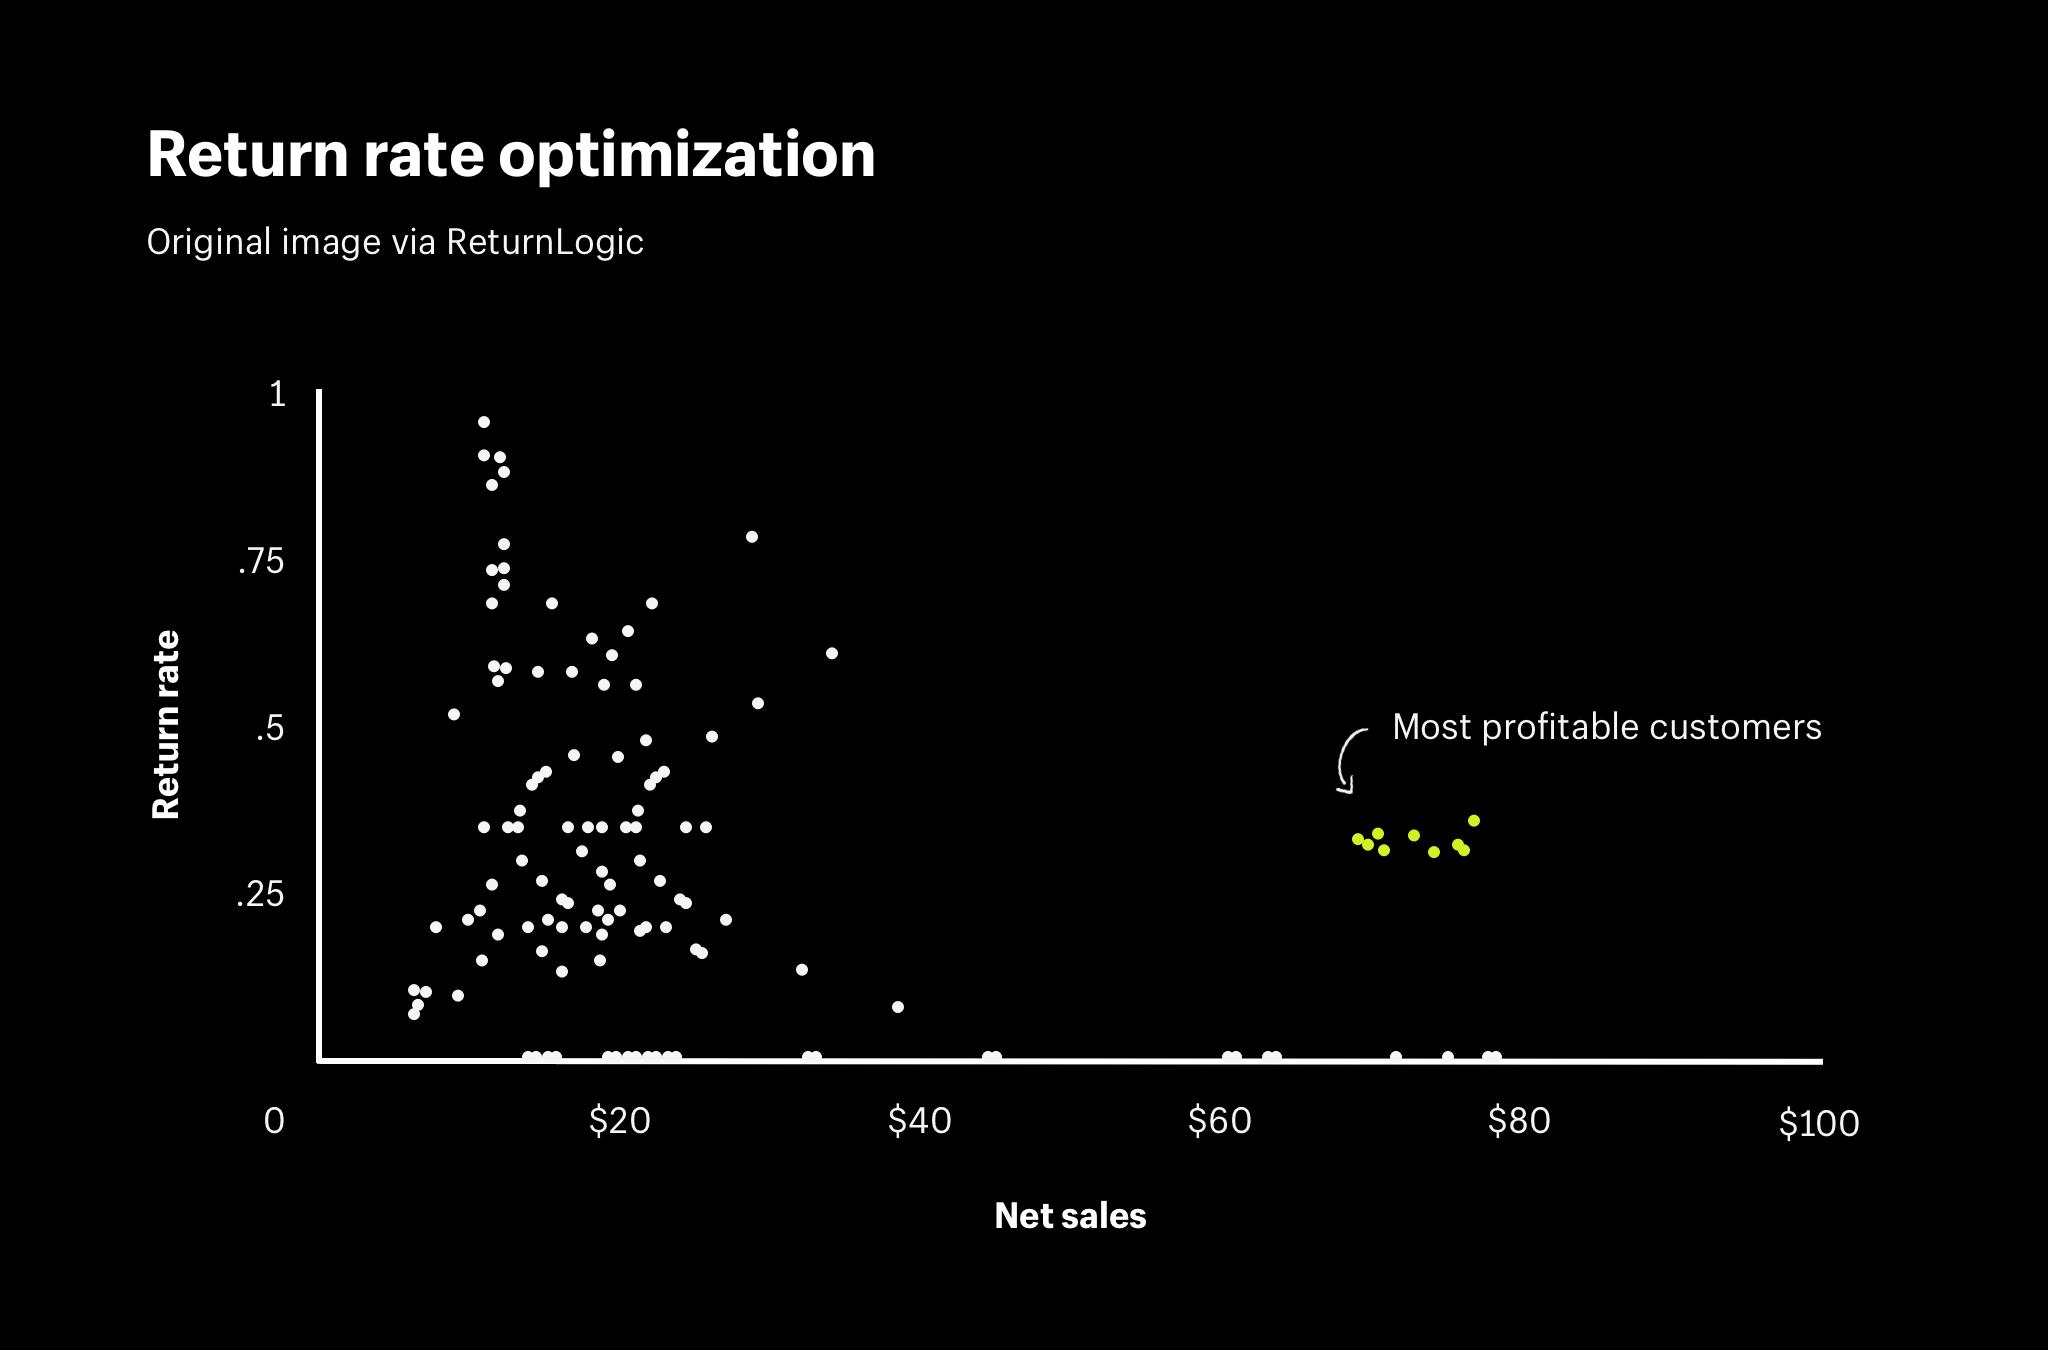 return rate optimization